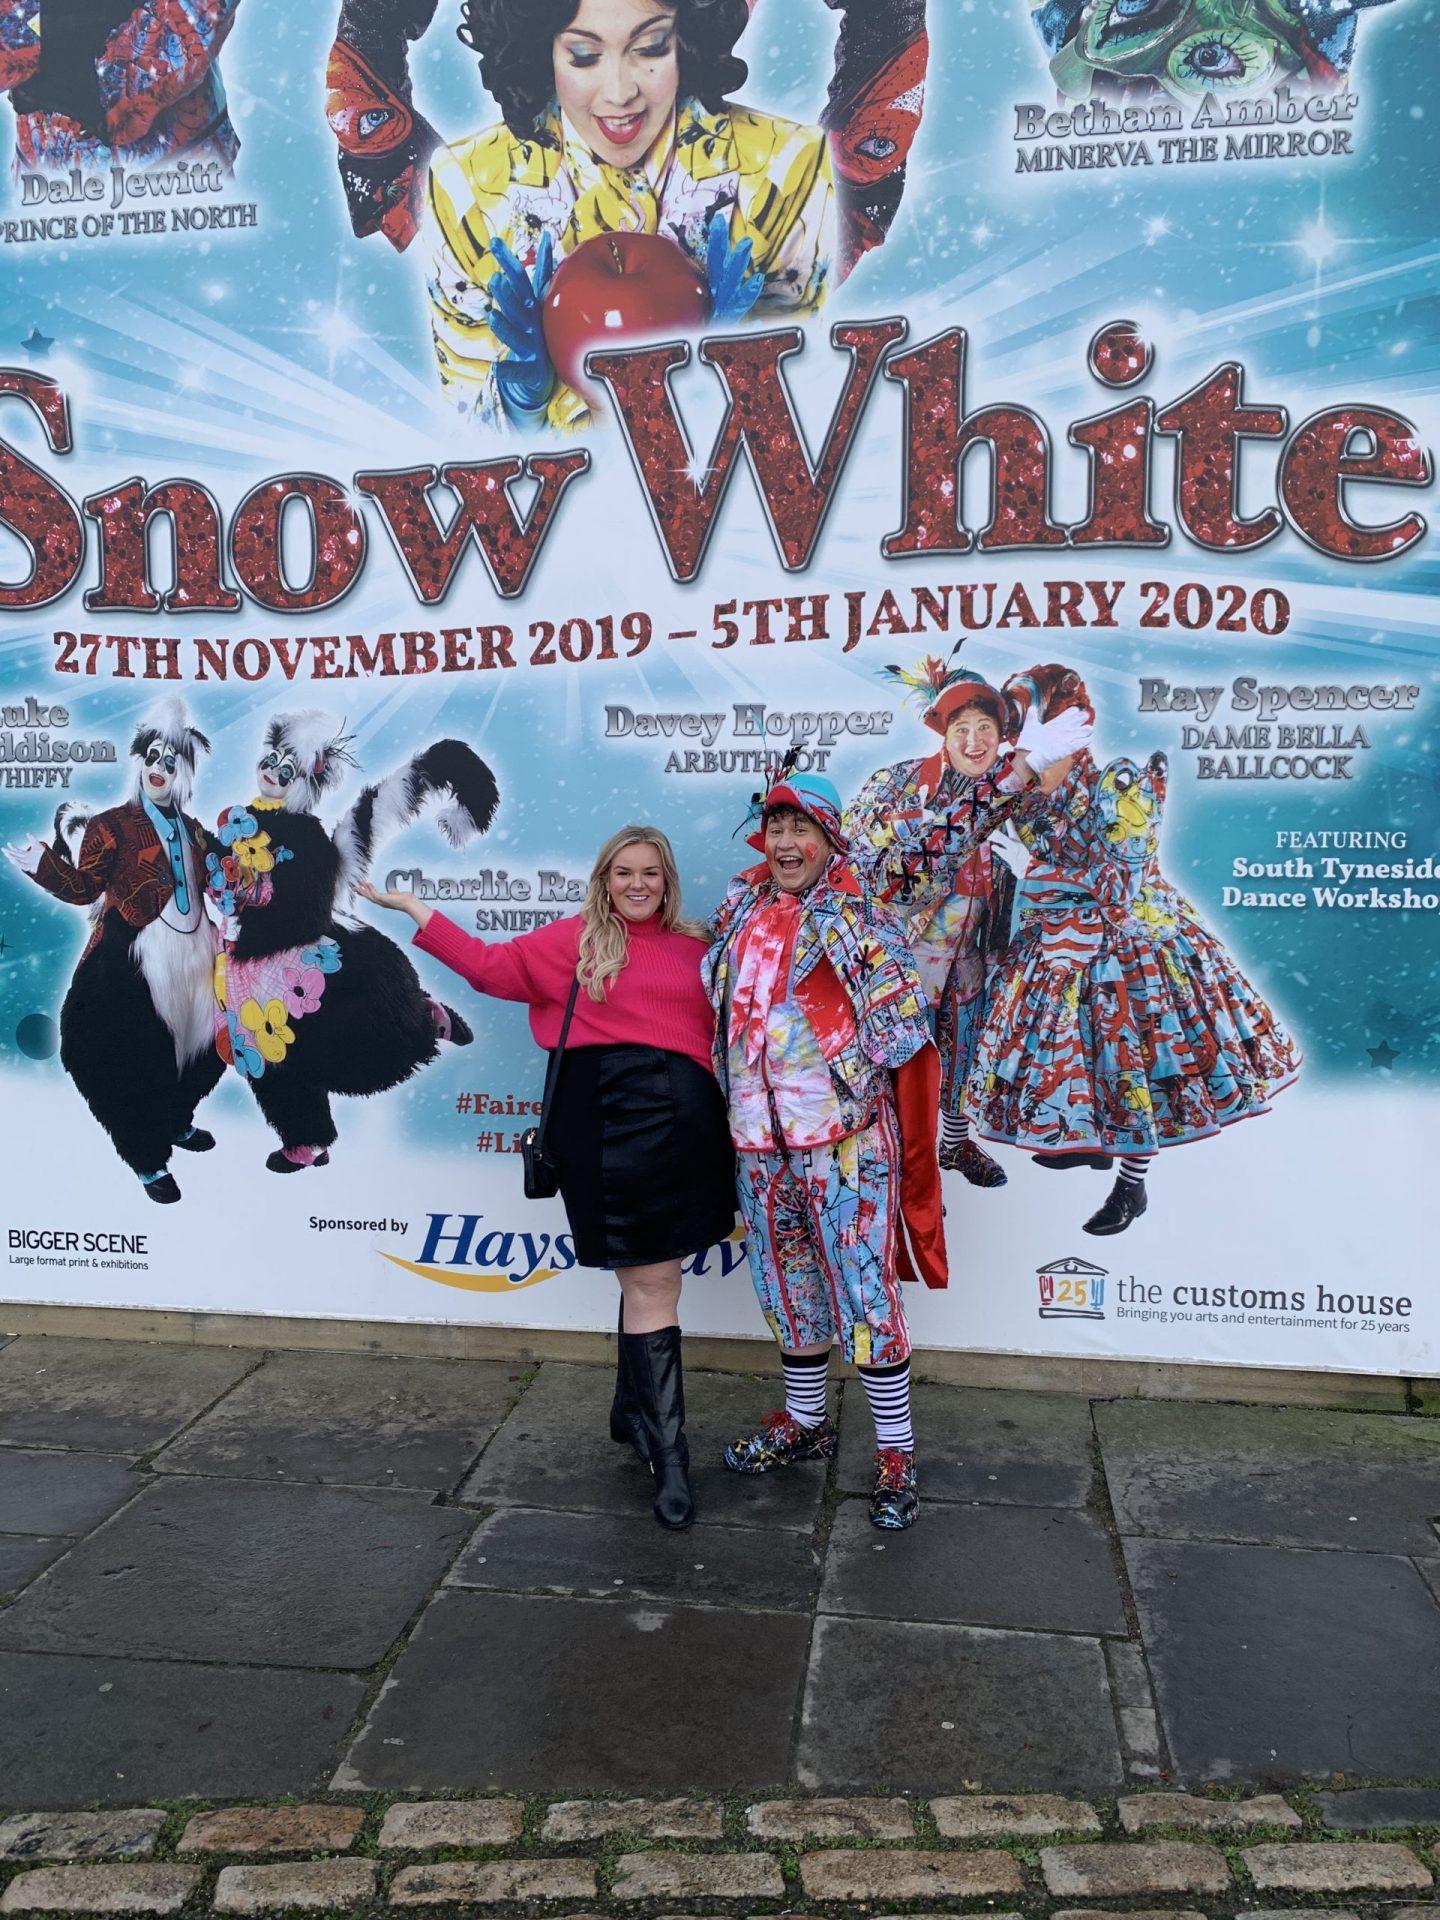 Snow White Customs House Panto Review